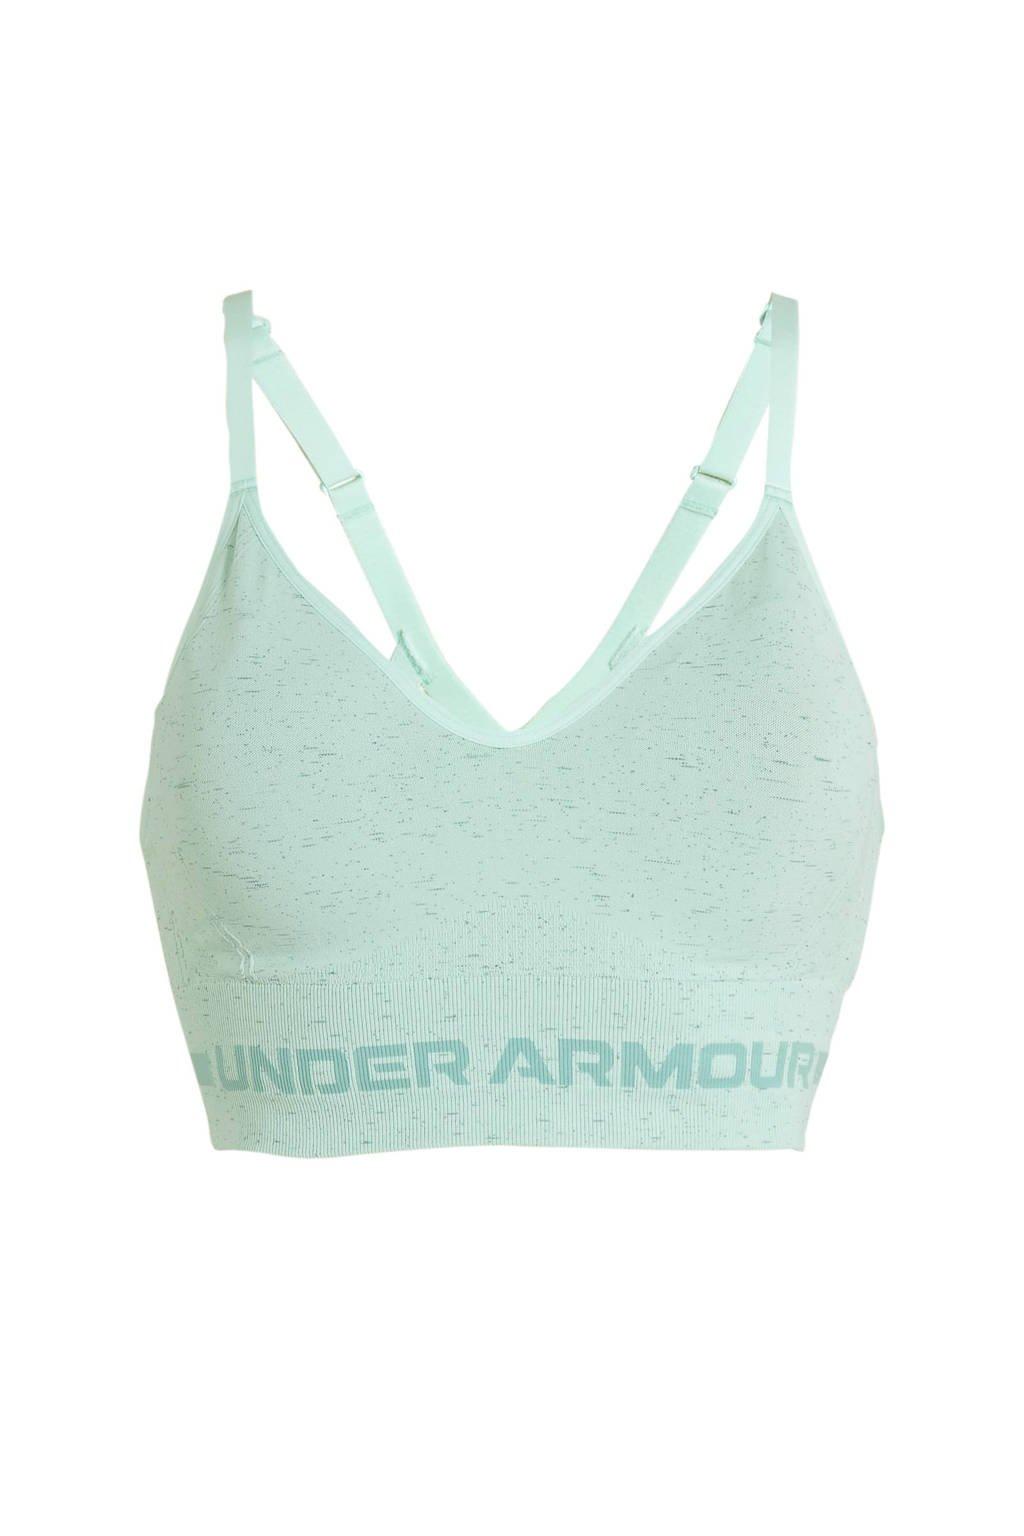 Under Armour level 1 sportbh mintgroen, Mintgroen